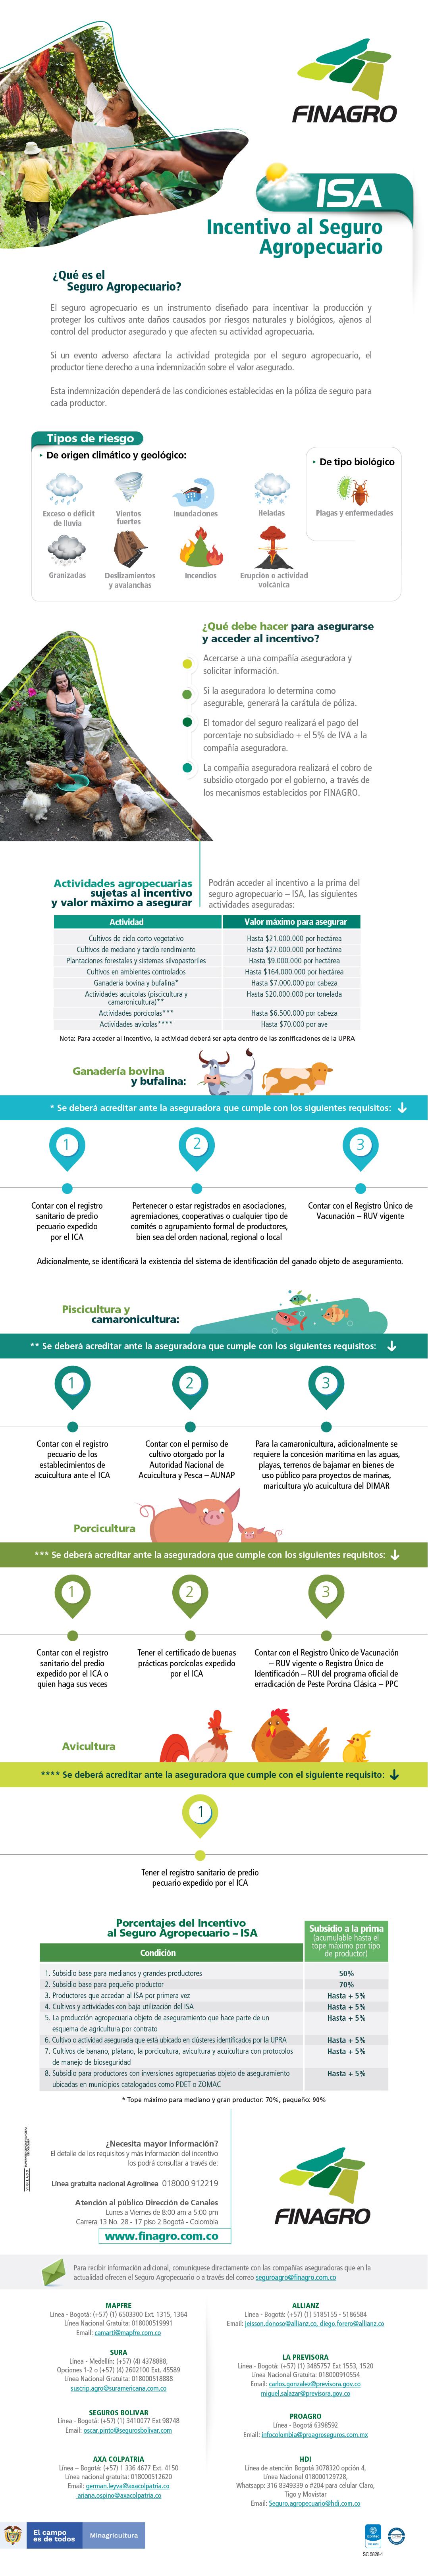 Explicación incentivo al seguro agropecuario